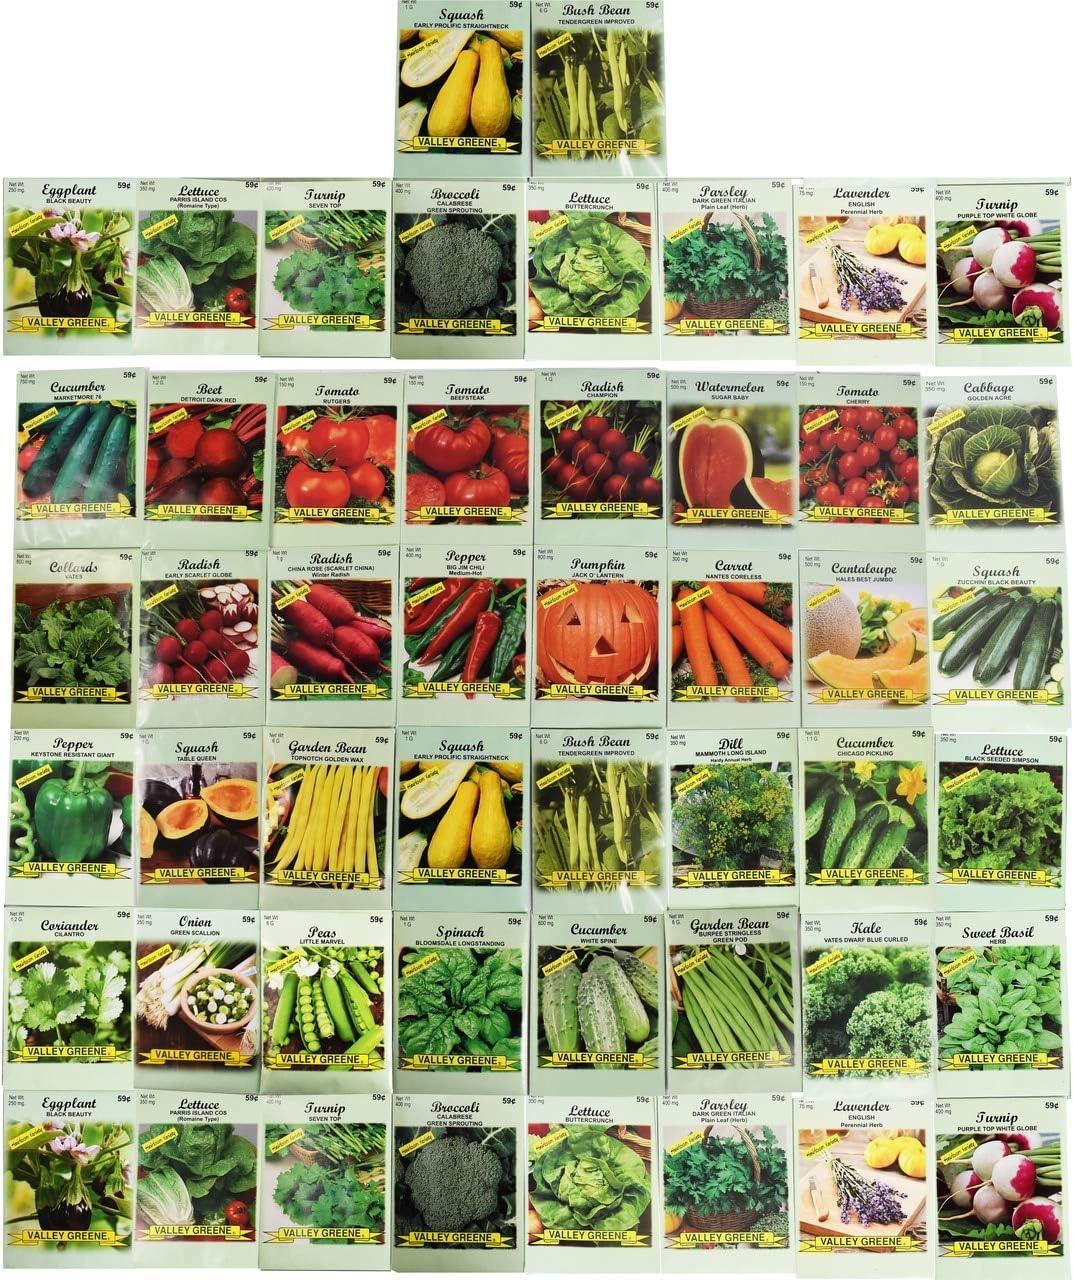 Mixed Autumn Winter 2200 Heirloom Seeds Vegetable Herb Seeds 23 Assorted Varieties Open-Pollinated NON-GMO Fresh Home Garden Easy Grow veg